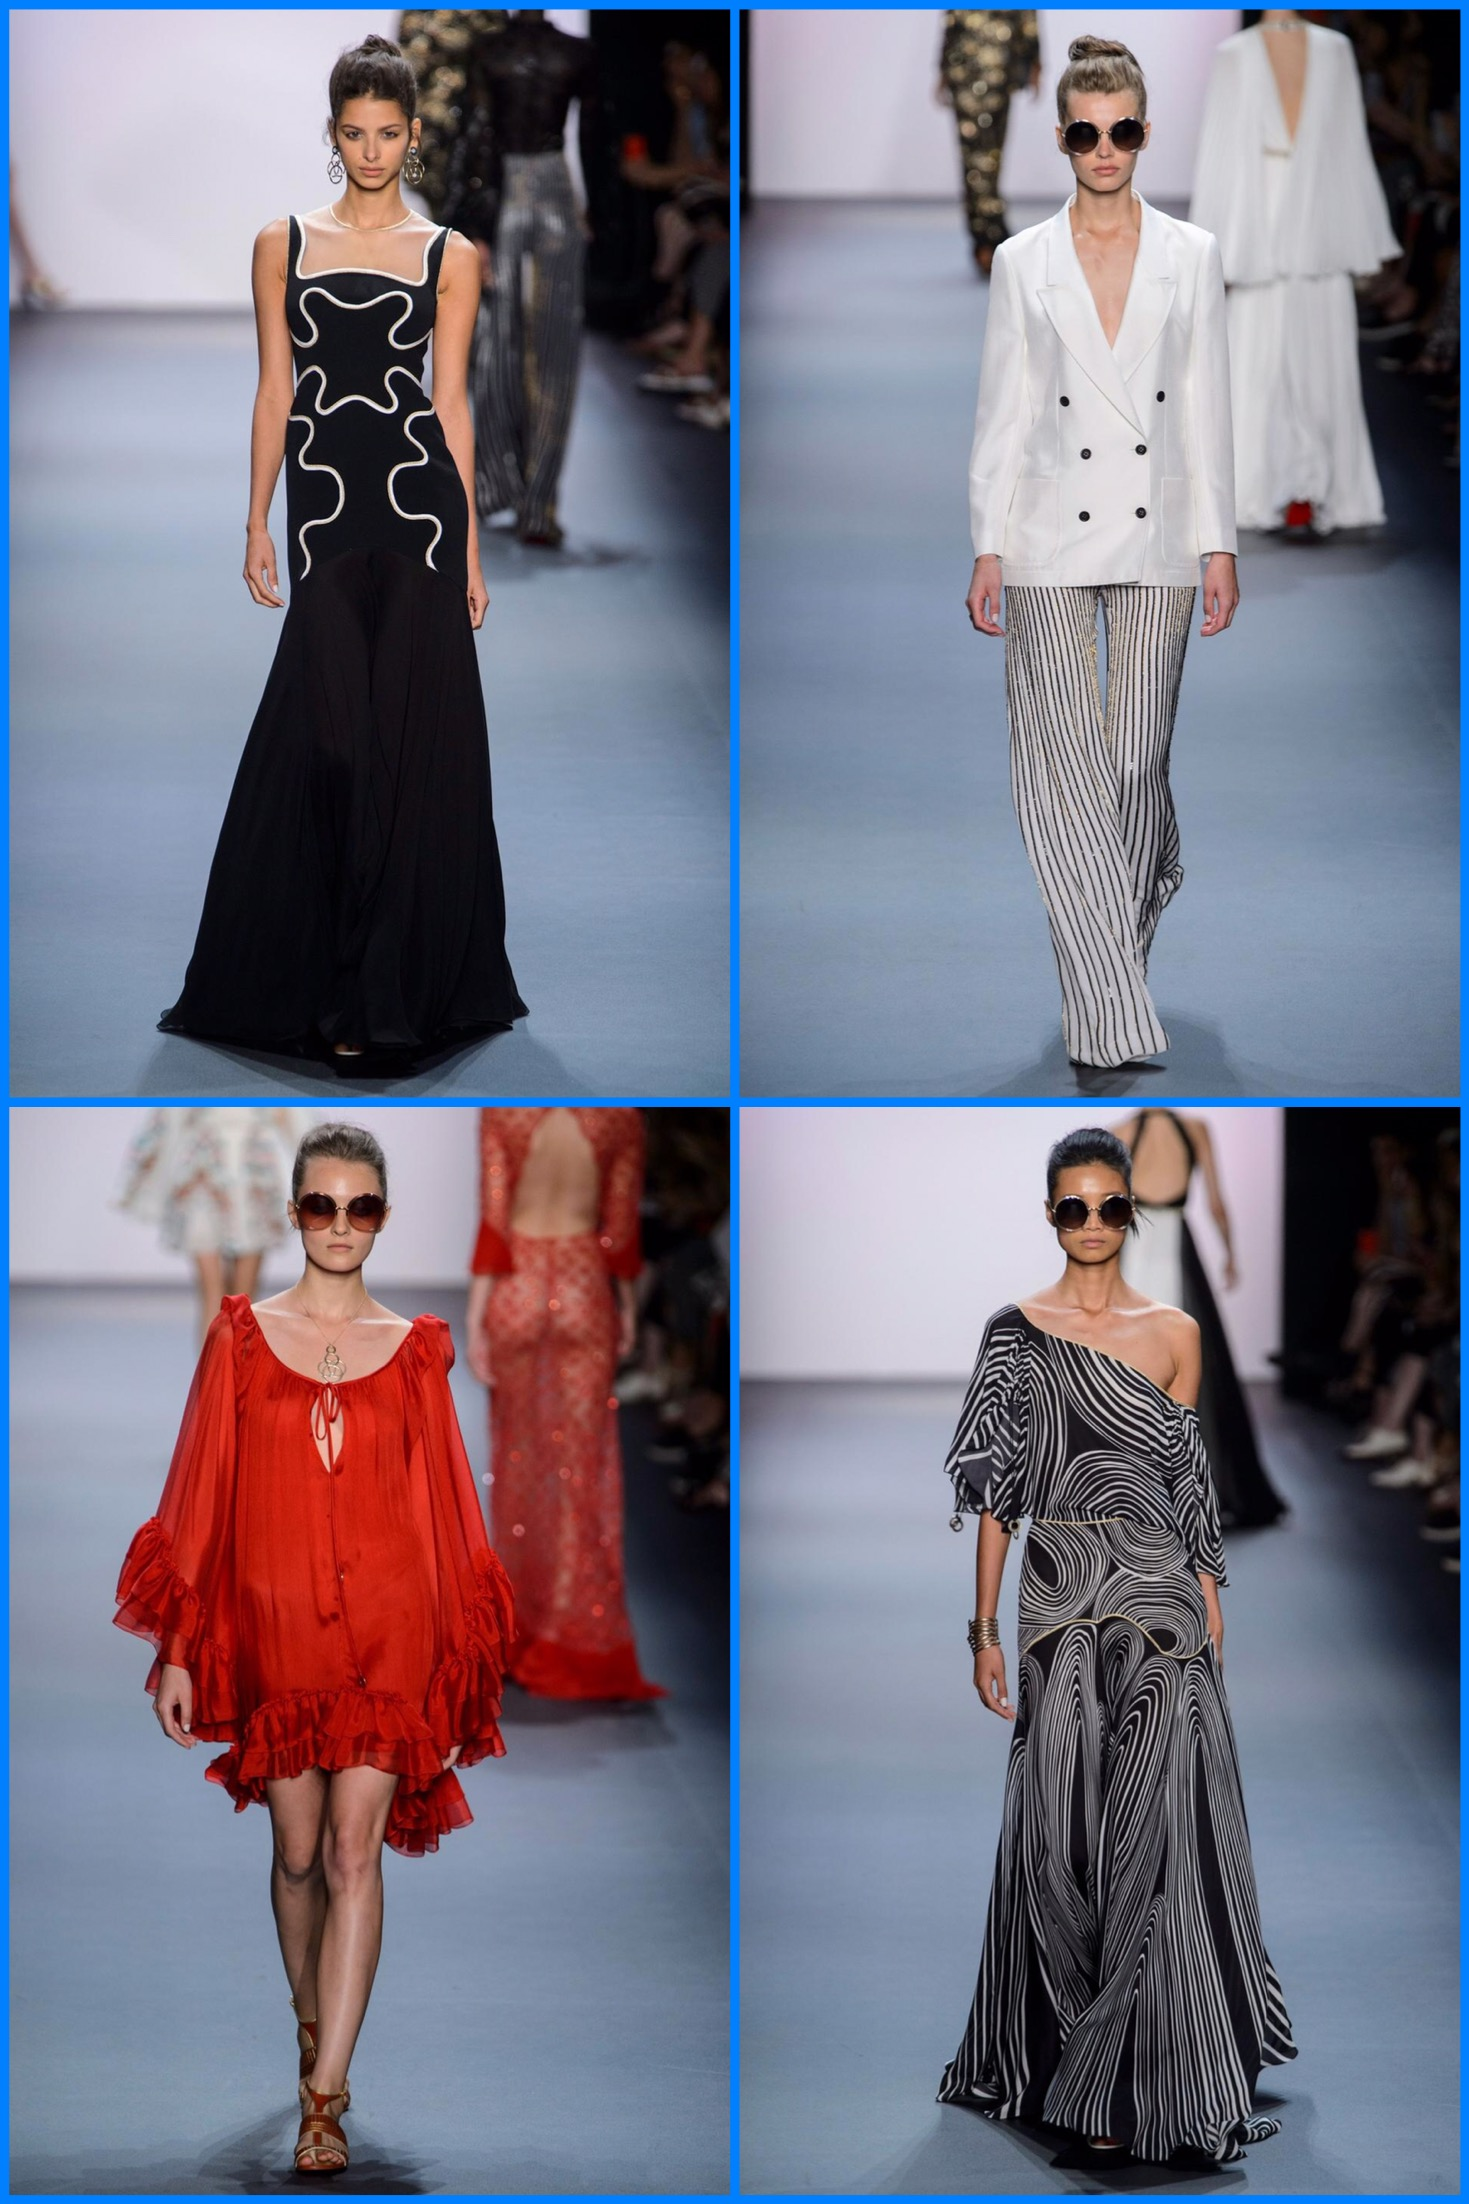 new-york-fashion-week-pret-a-porter-spring-summer-2017-style-jenny-packham